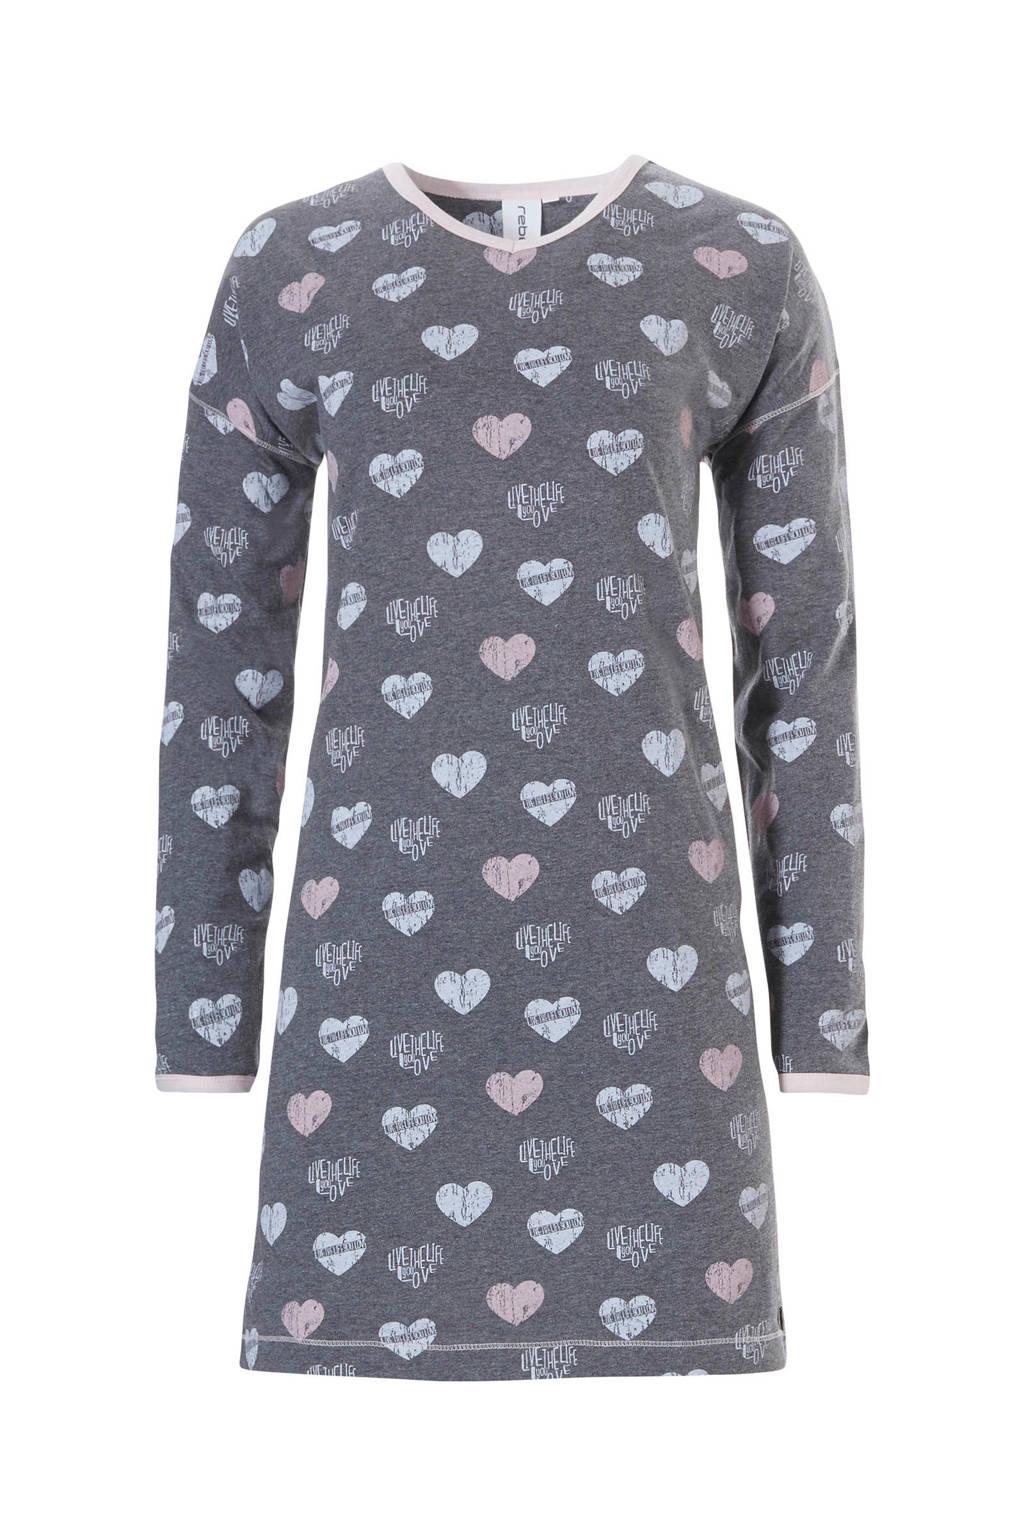 Rebelle nachthemd met all over print donkergrijs, Donkergrijs/roze/lichtblauw